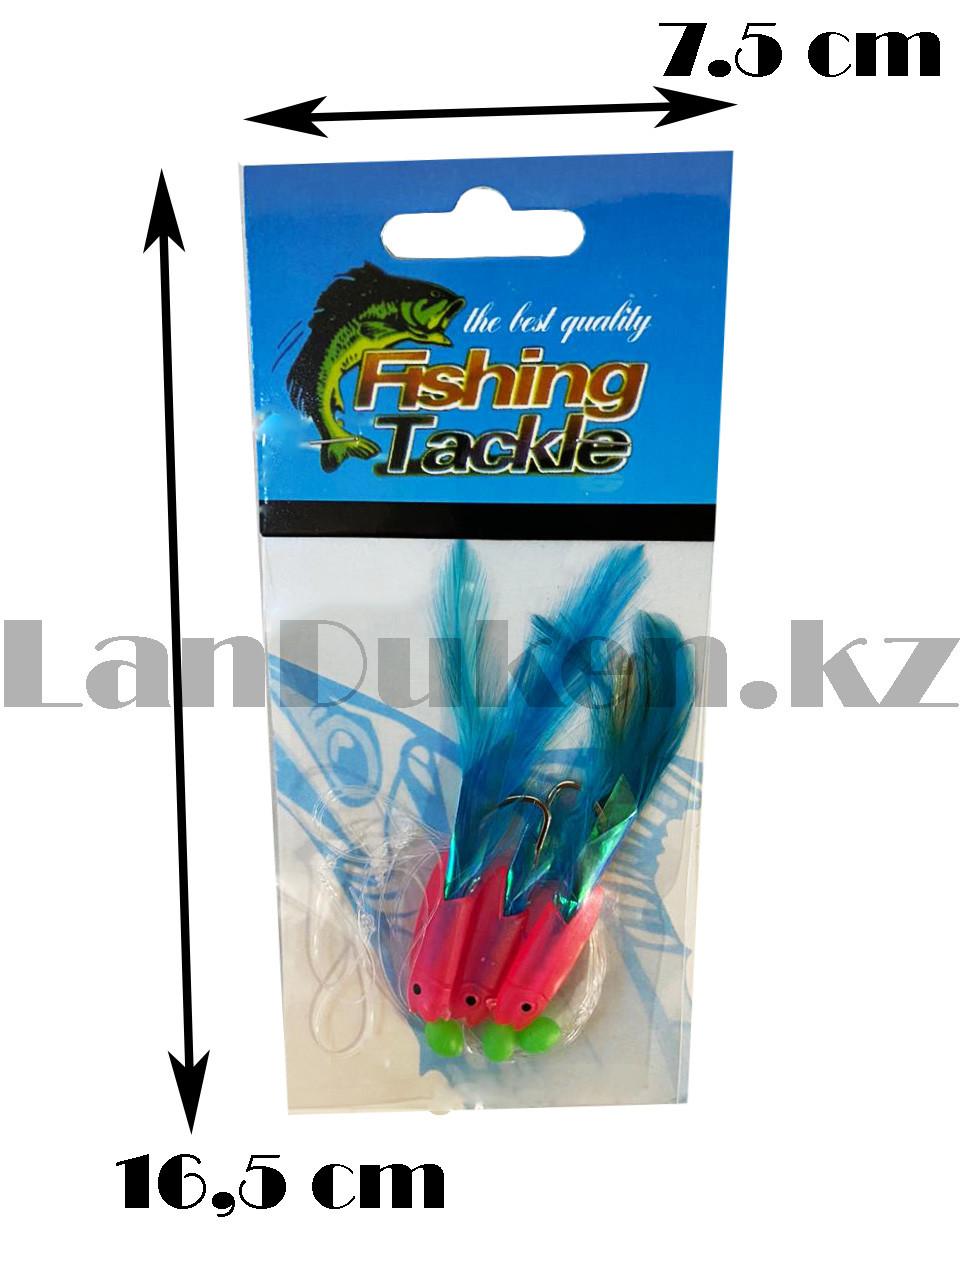 Блесна для рыбной ловли Fishing Tackle розового цвета с 3-мя крючками - фото 2